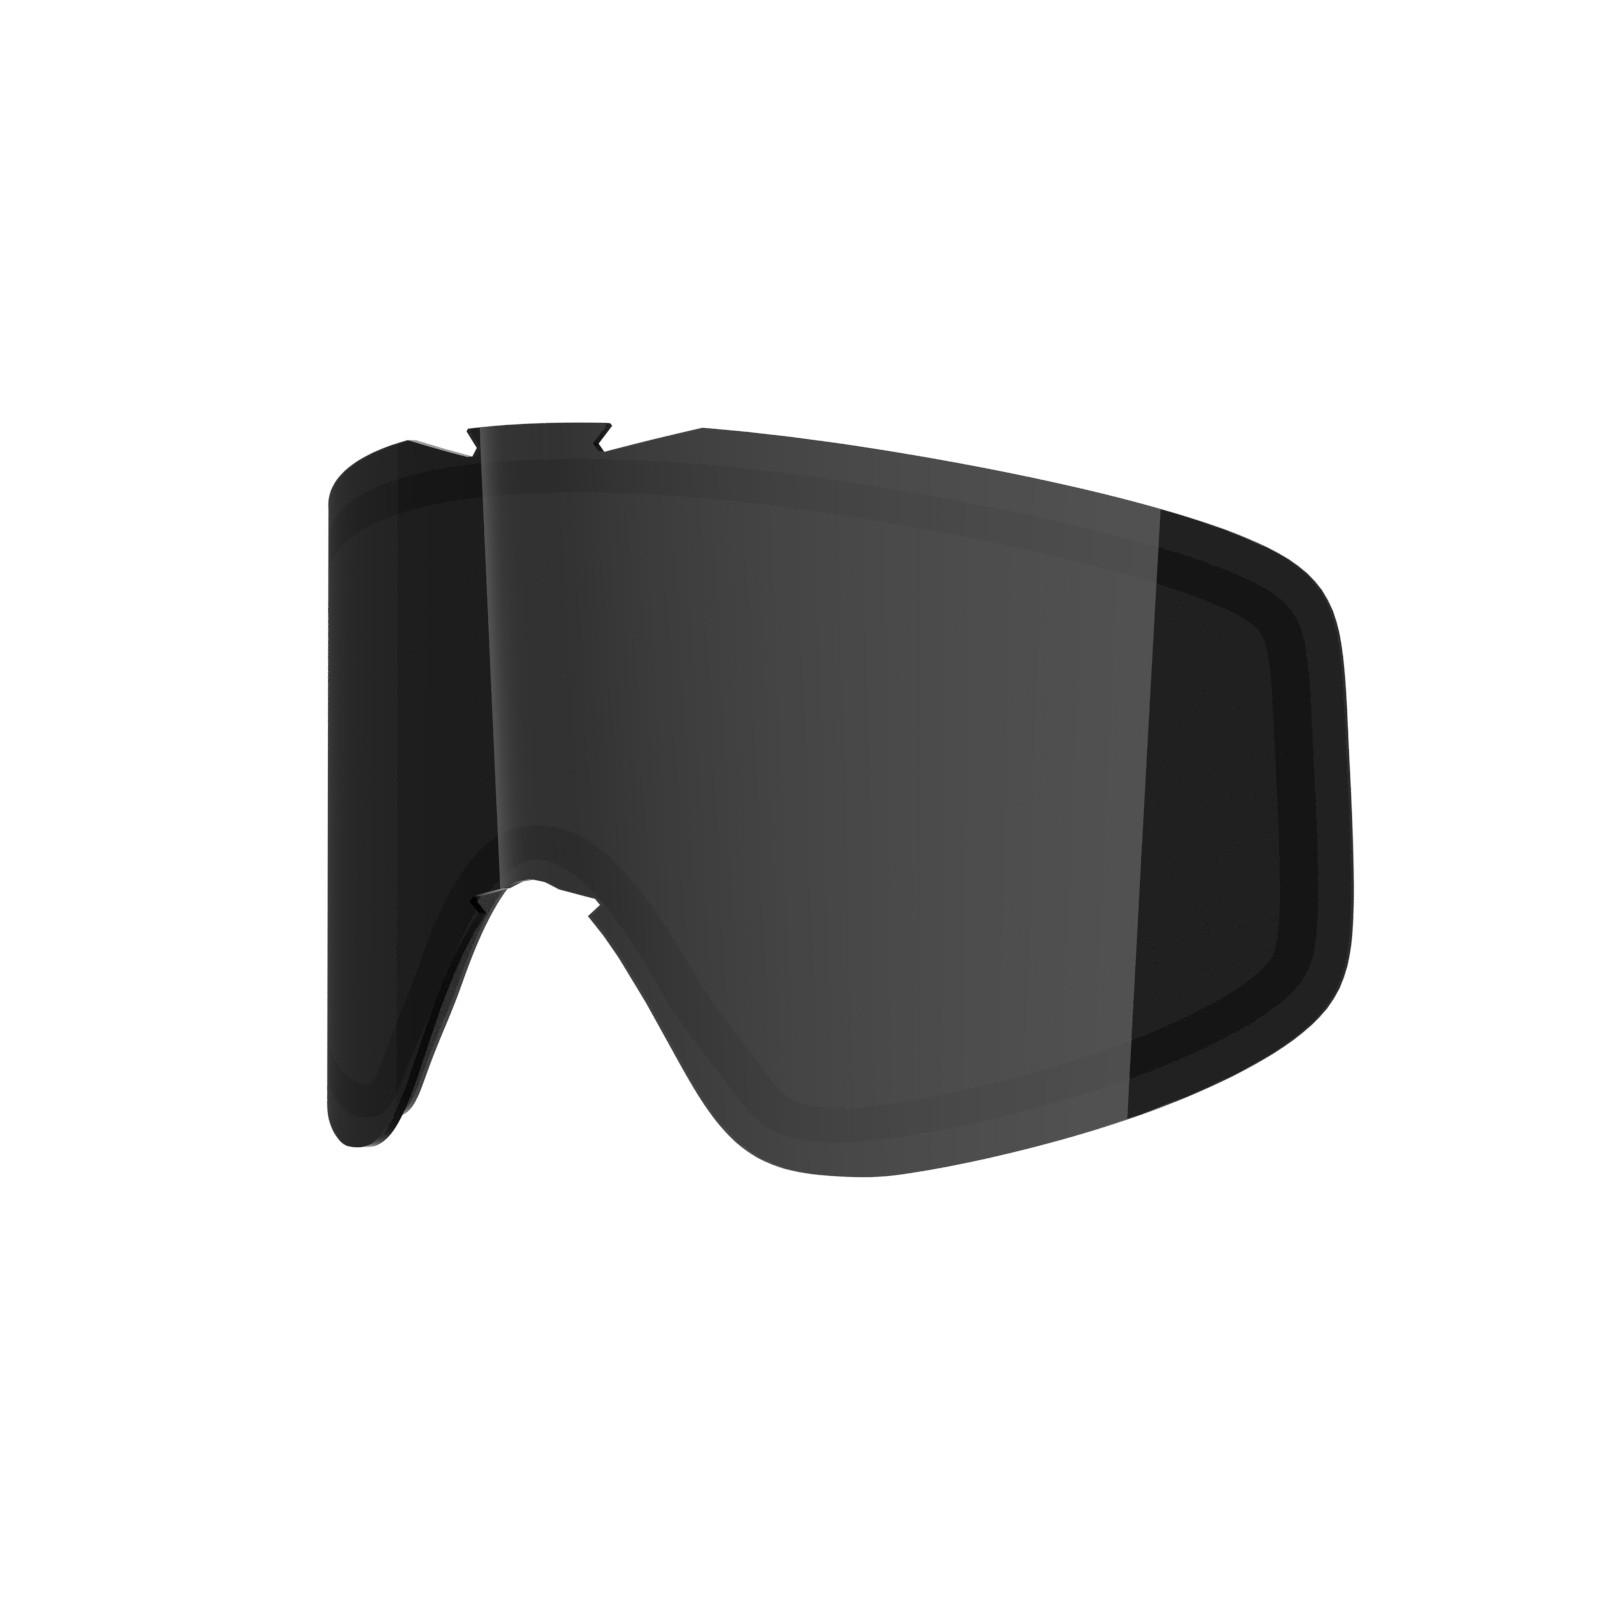 SMOKE lens for  Flat goggle